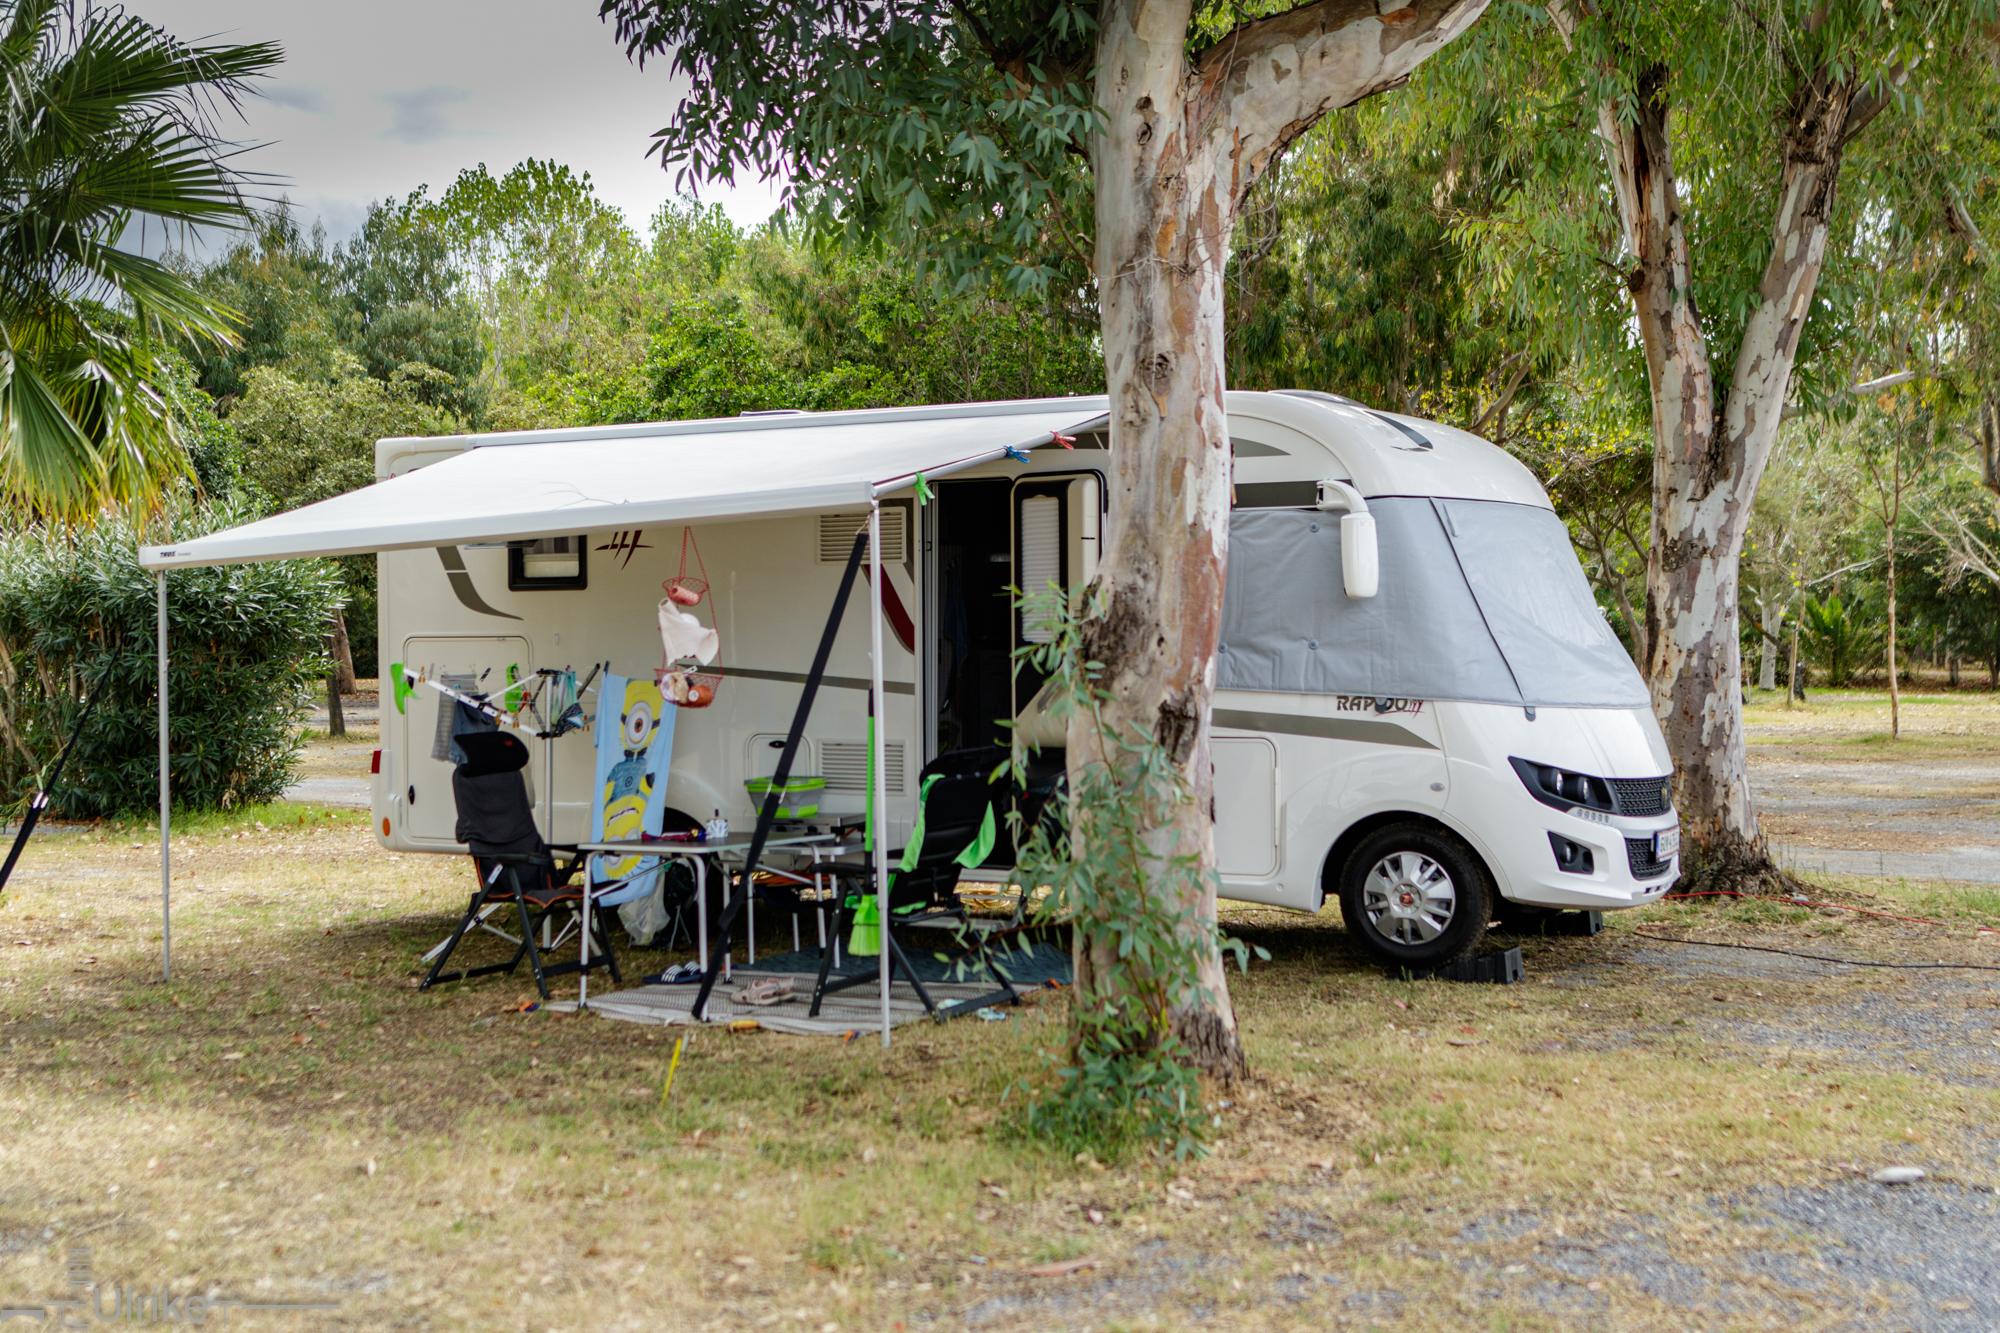 Camp Ulisse